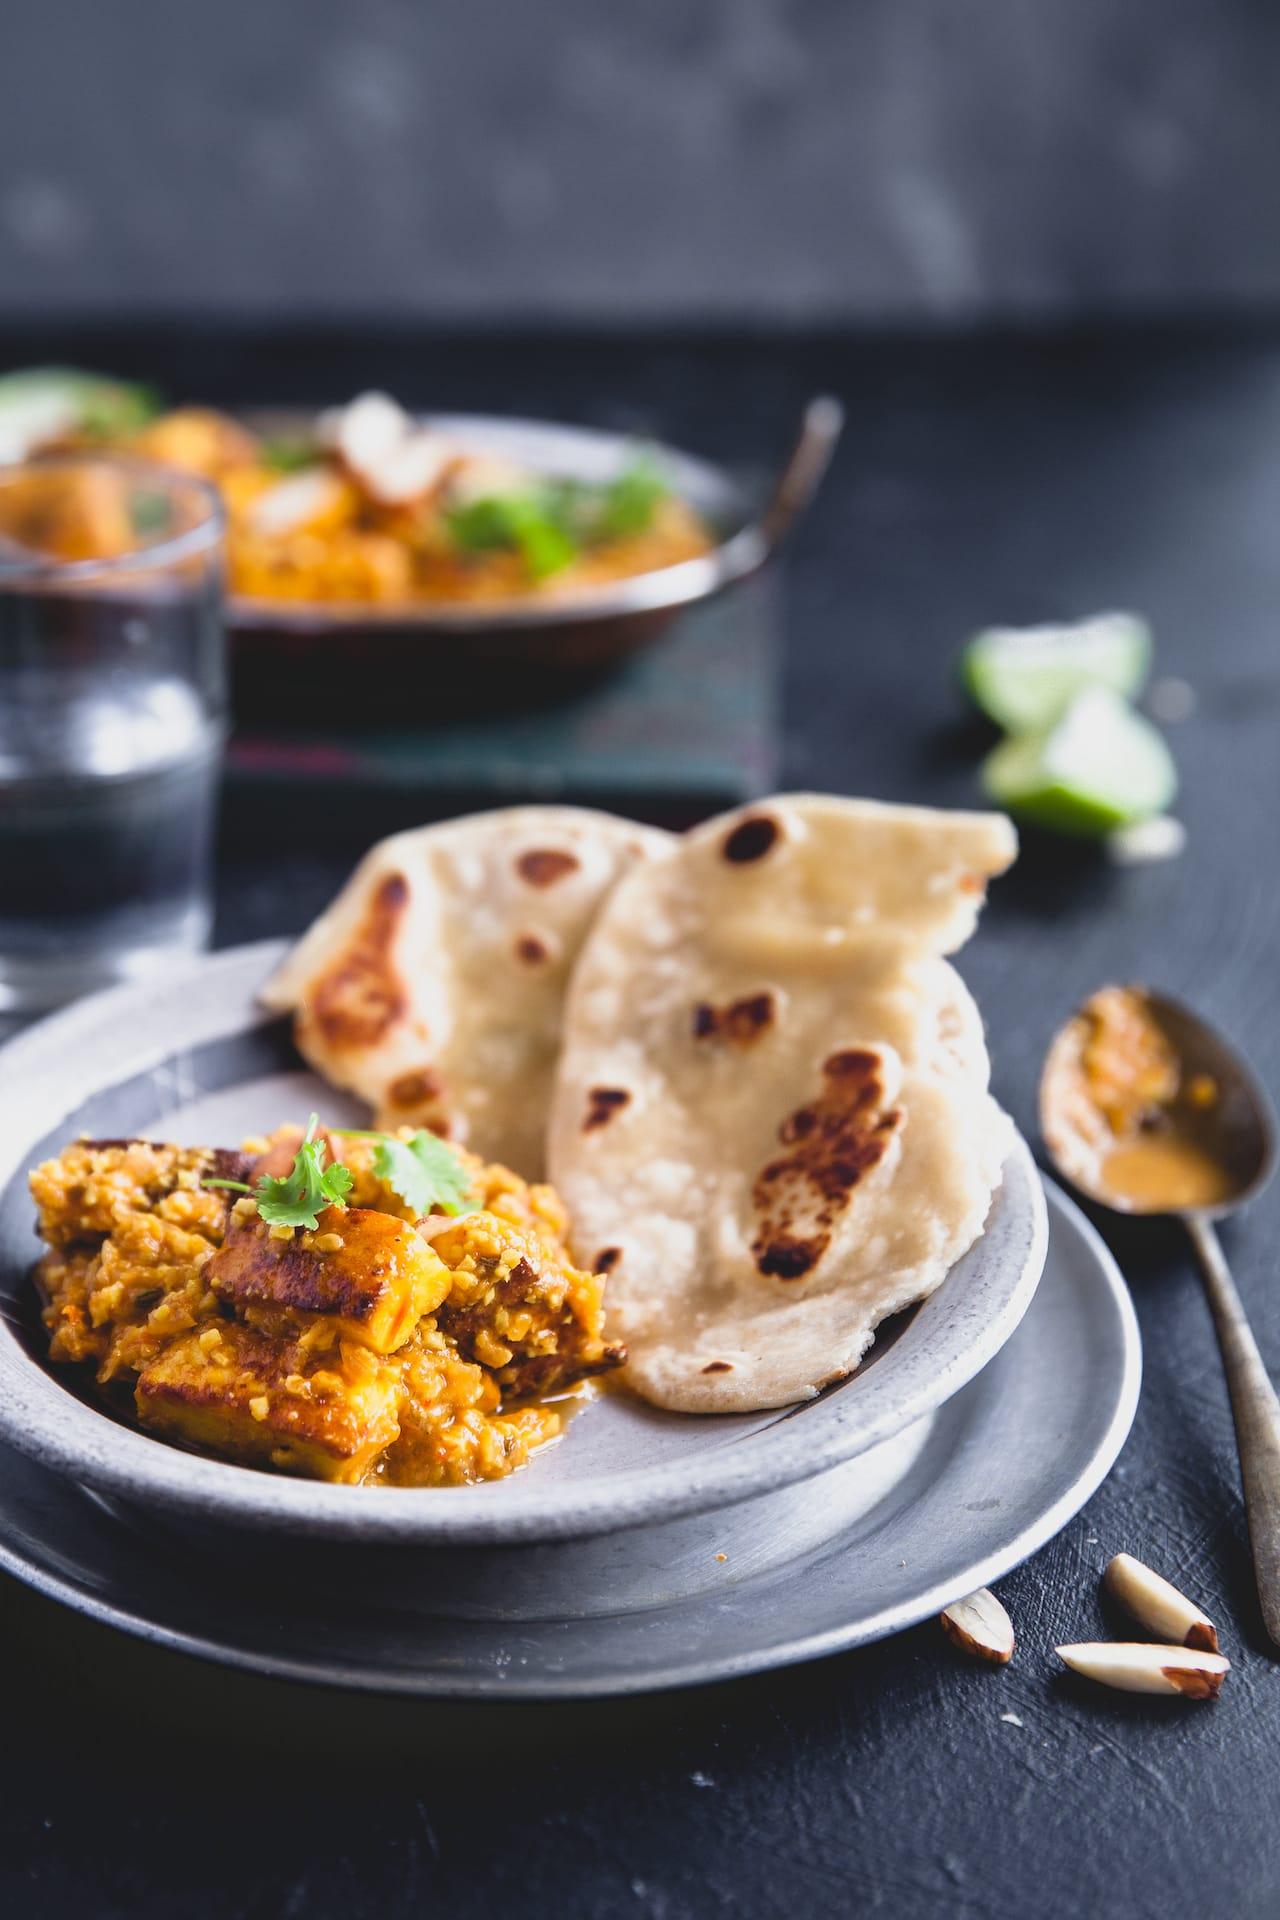 Badami Paneer (Paneer in creamy almond gravy) | Playful Cooking